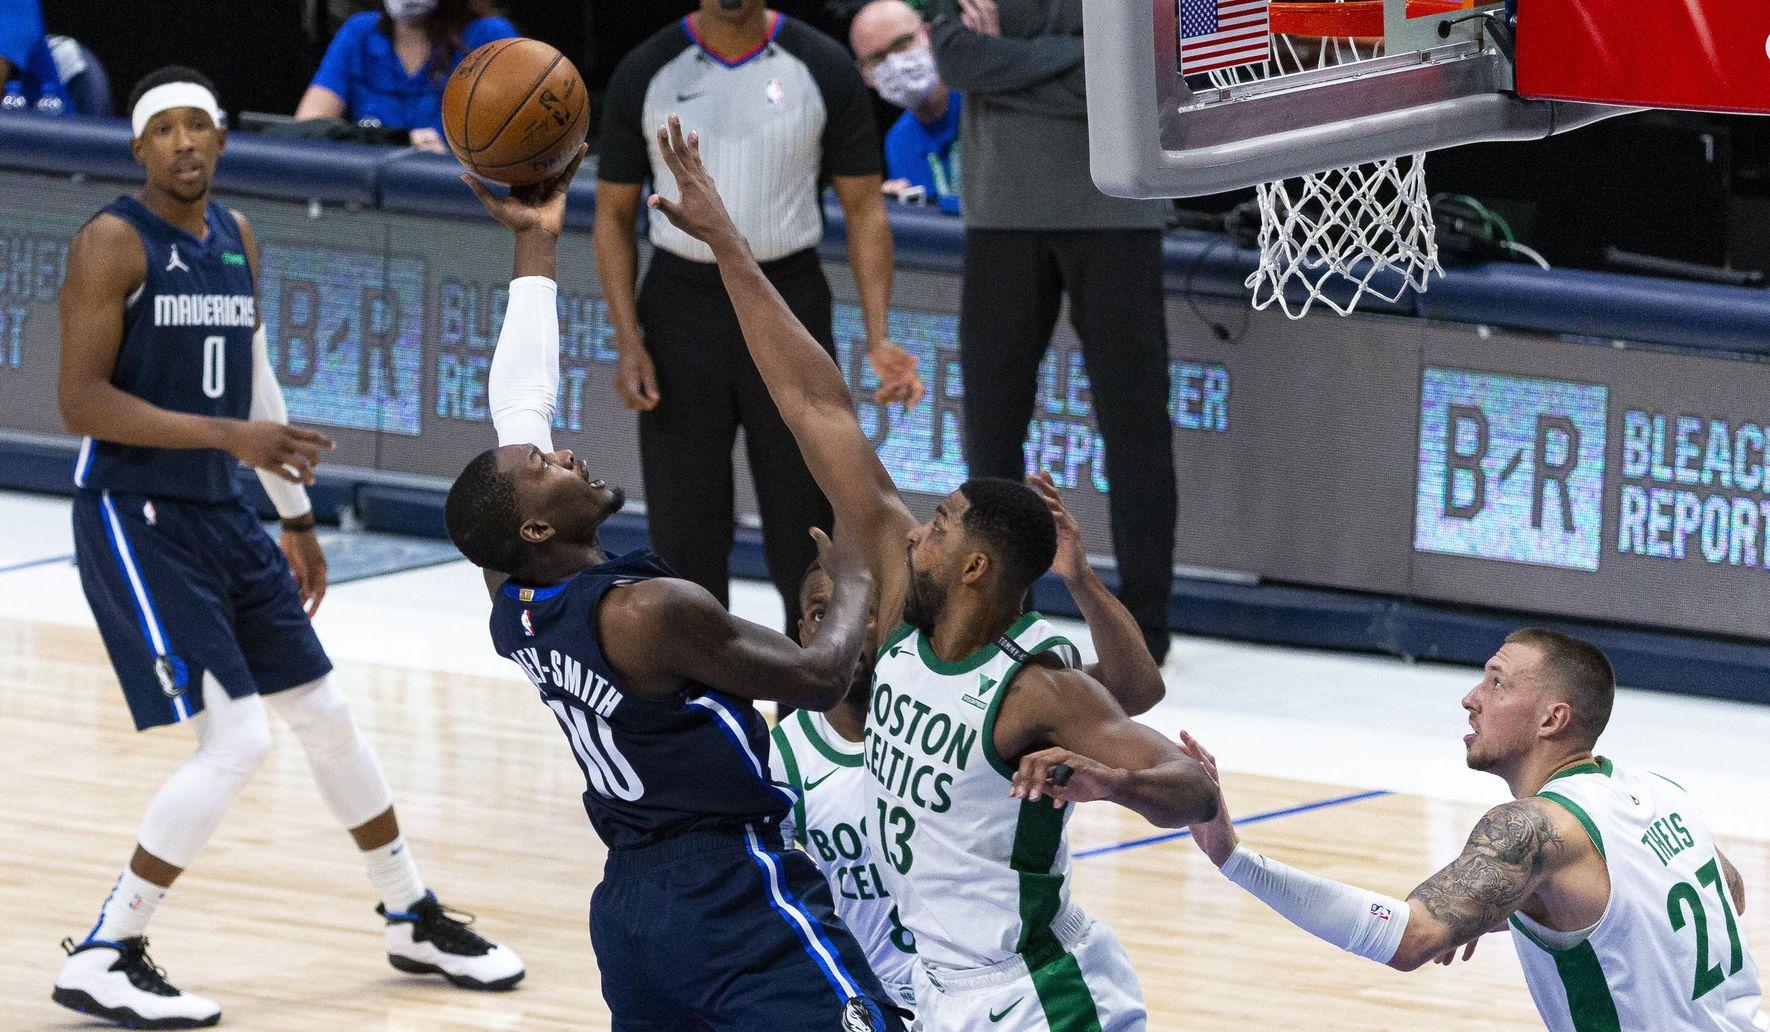 Celtics_mavericks_basketball_83999_c0-146-3501-2187_s1770x1032